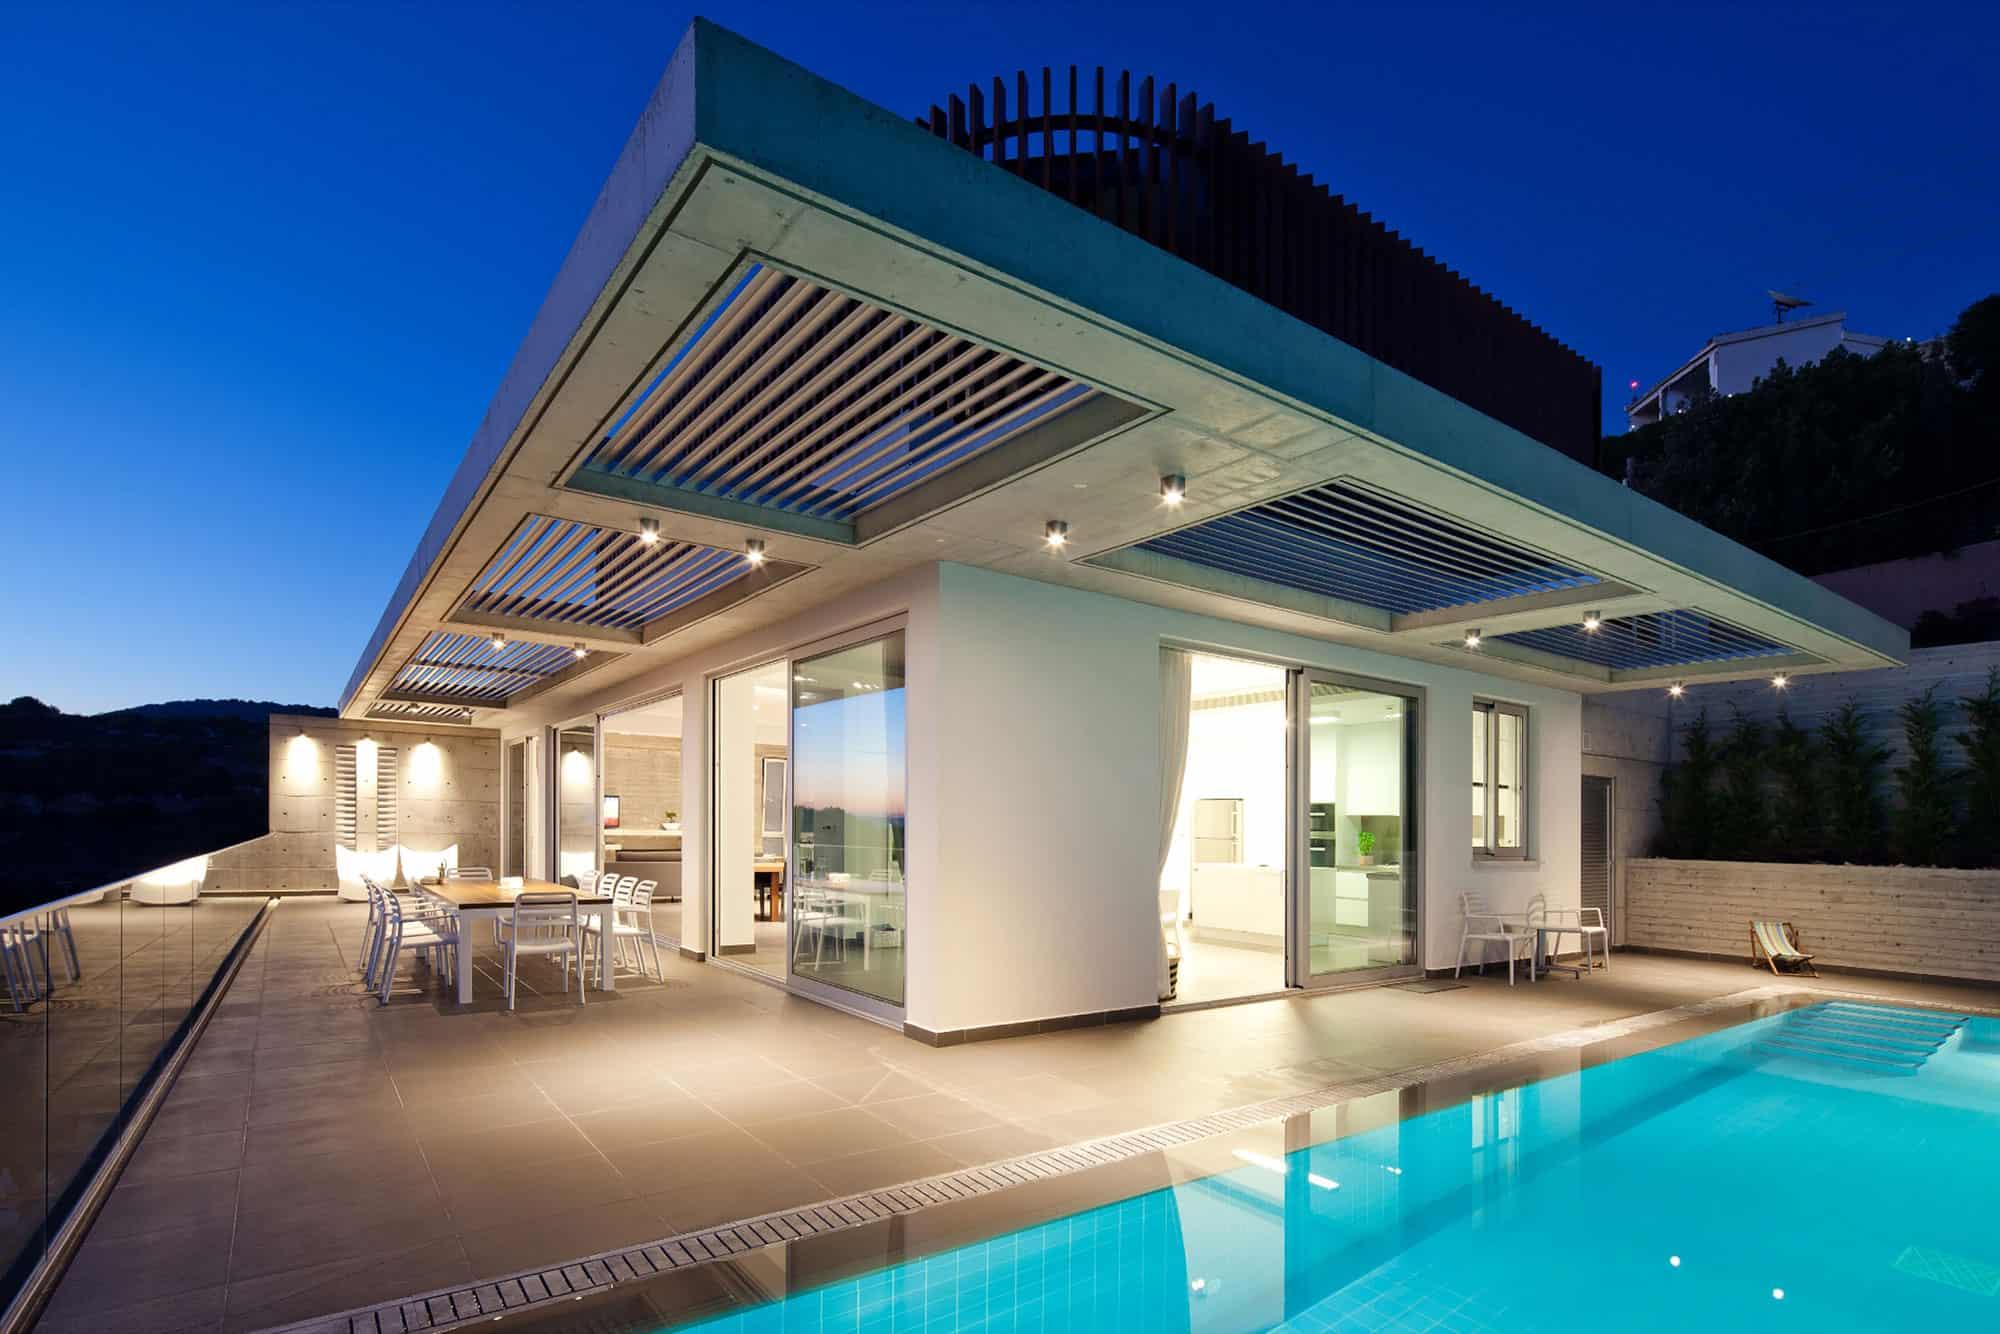 podromos and desi residence by vardastudio architects designers - Desi Home Pic